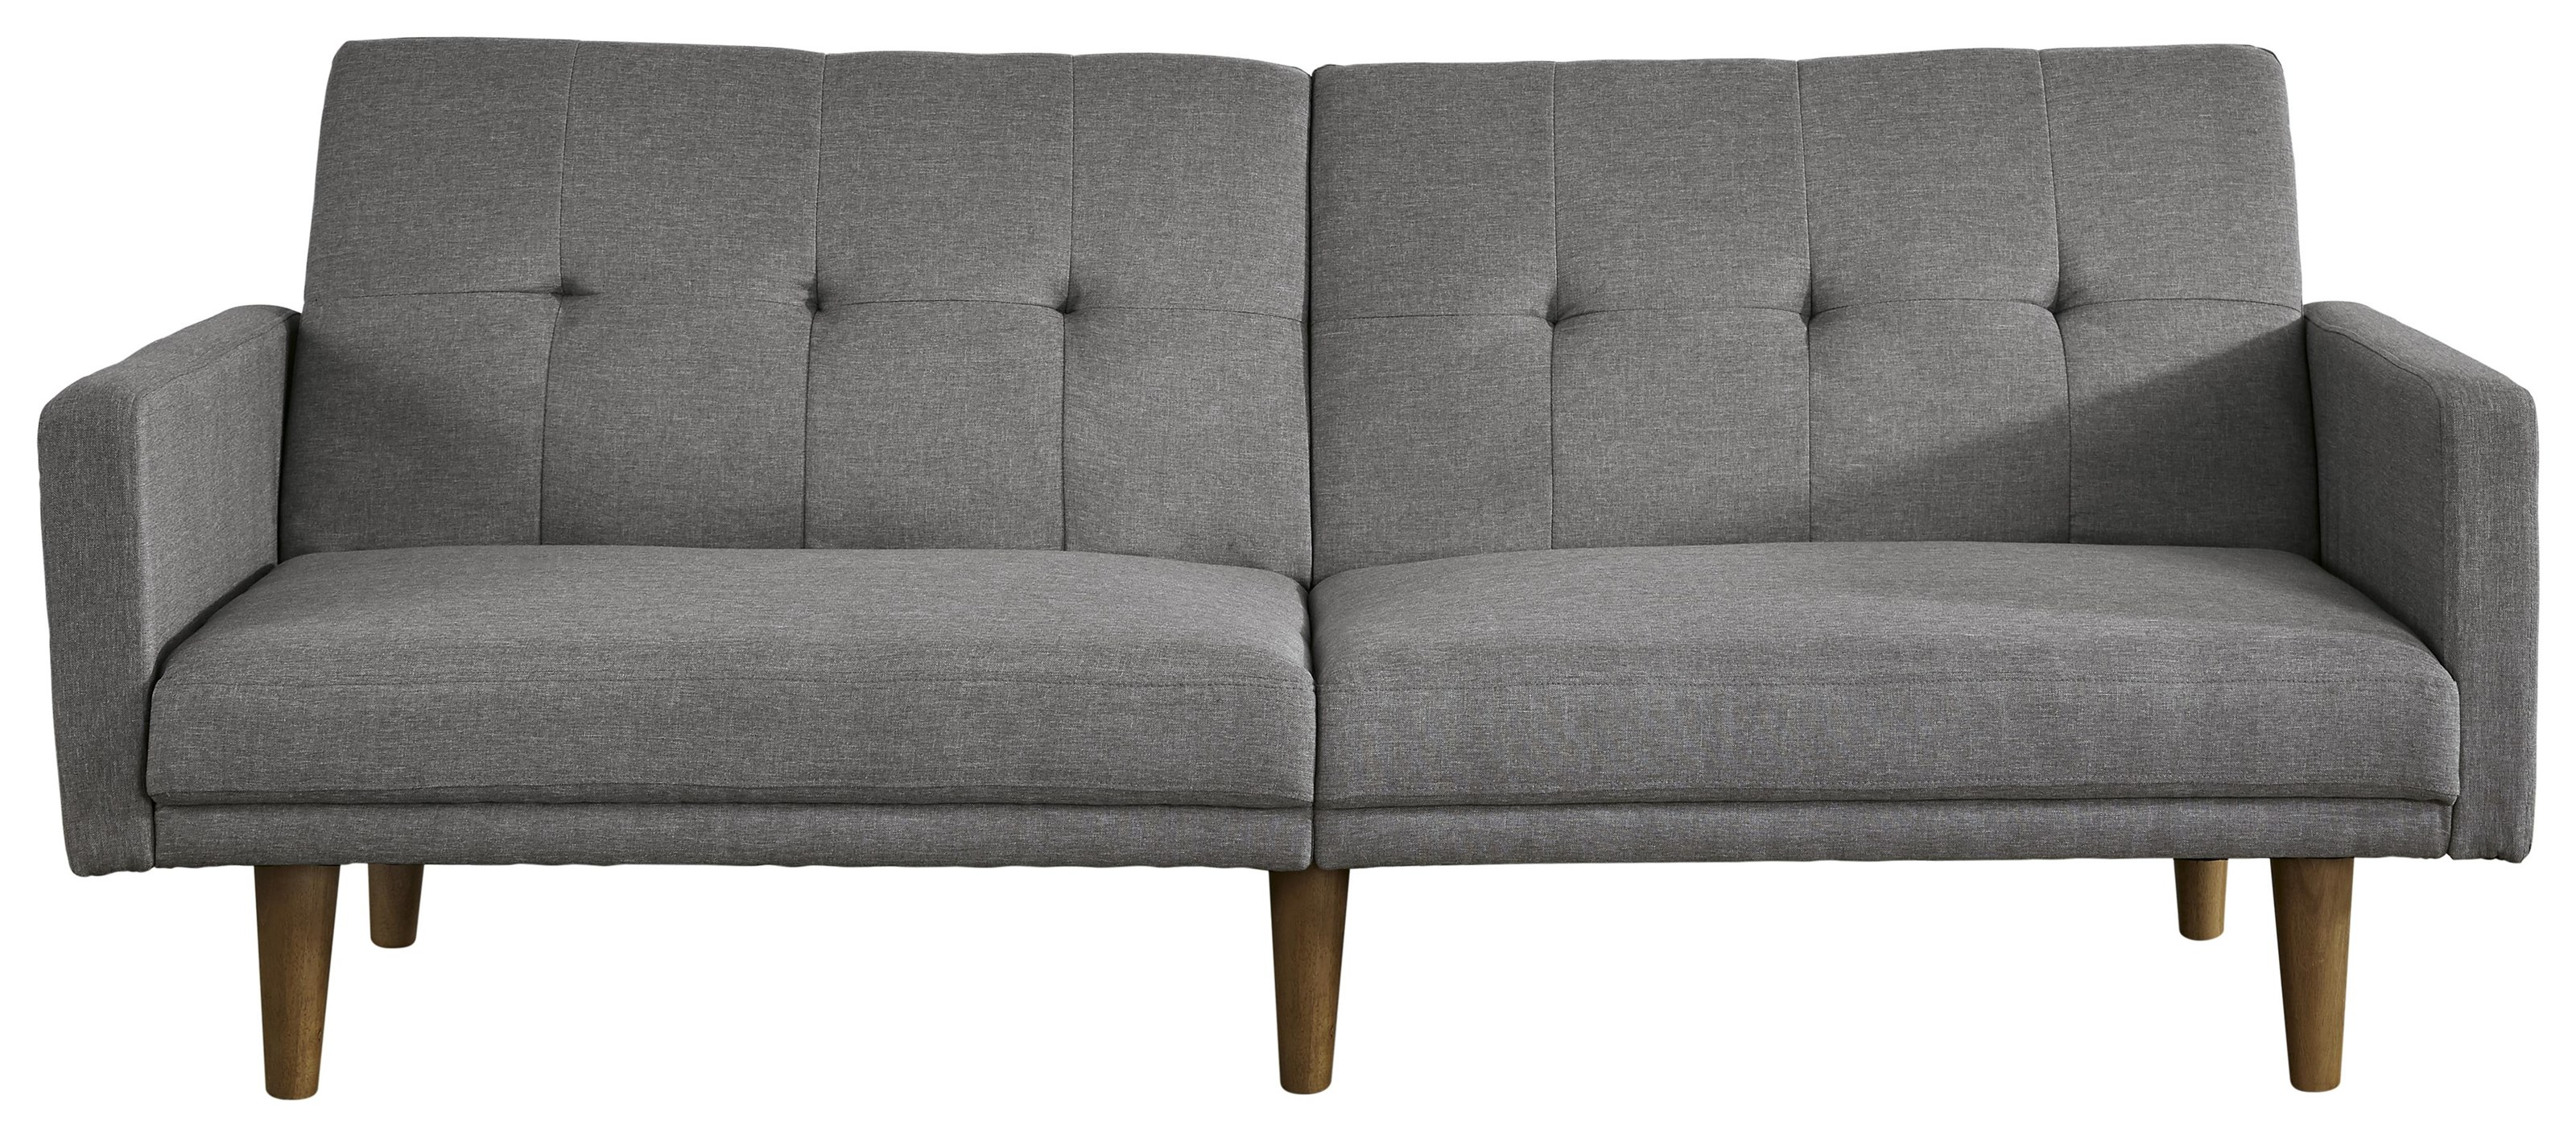 Gaddos Flip Flop Sofa by Signature Design by Ashley at Sam Levitz Furniture